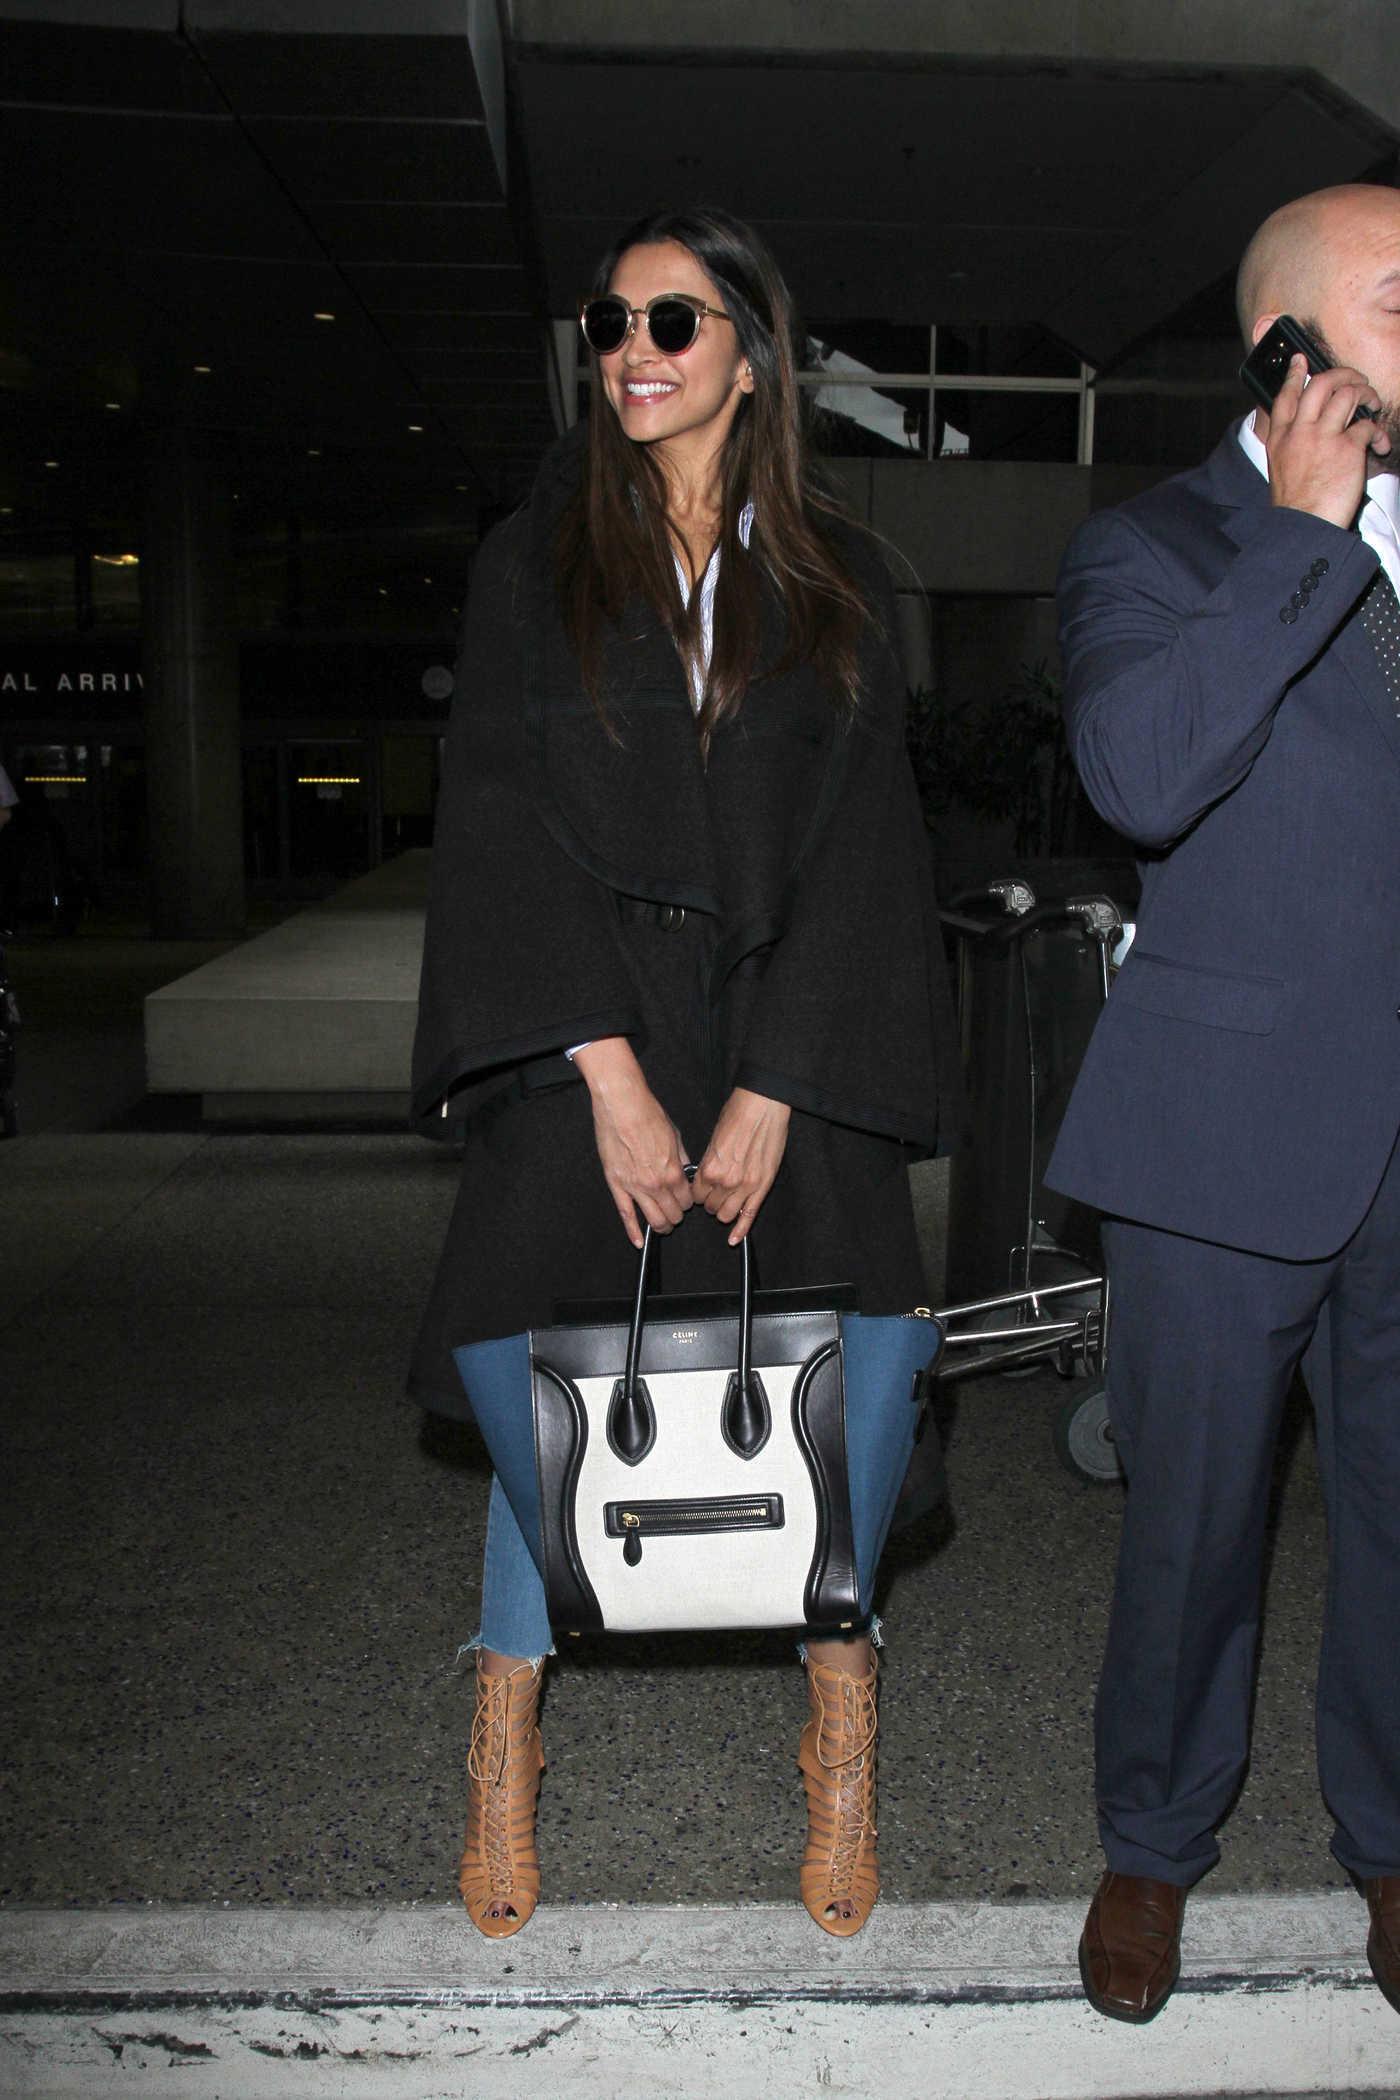 Deepika Padukone Was Seen at LAX Airport in Los Angeles 01/02/2017